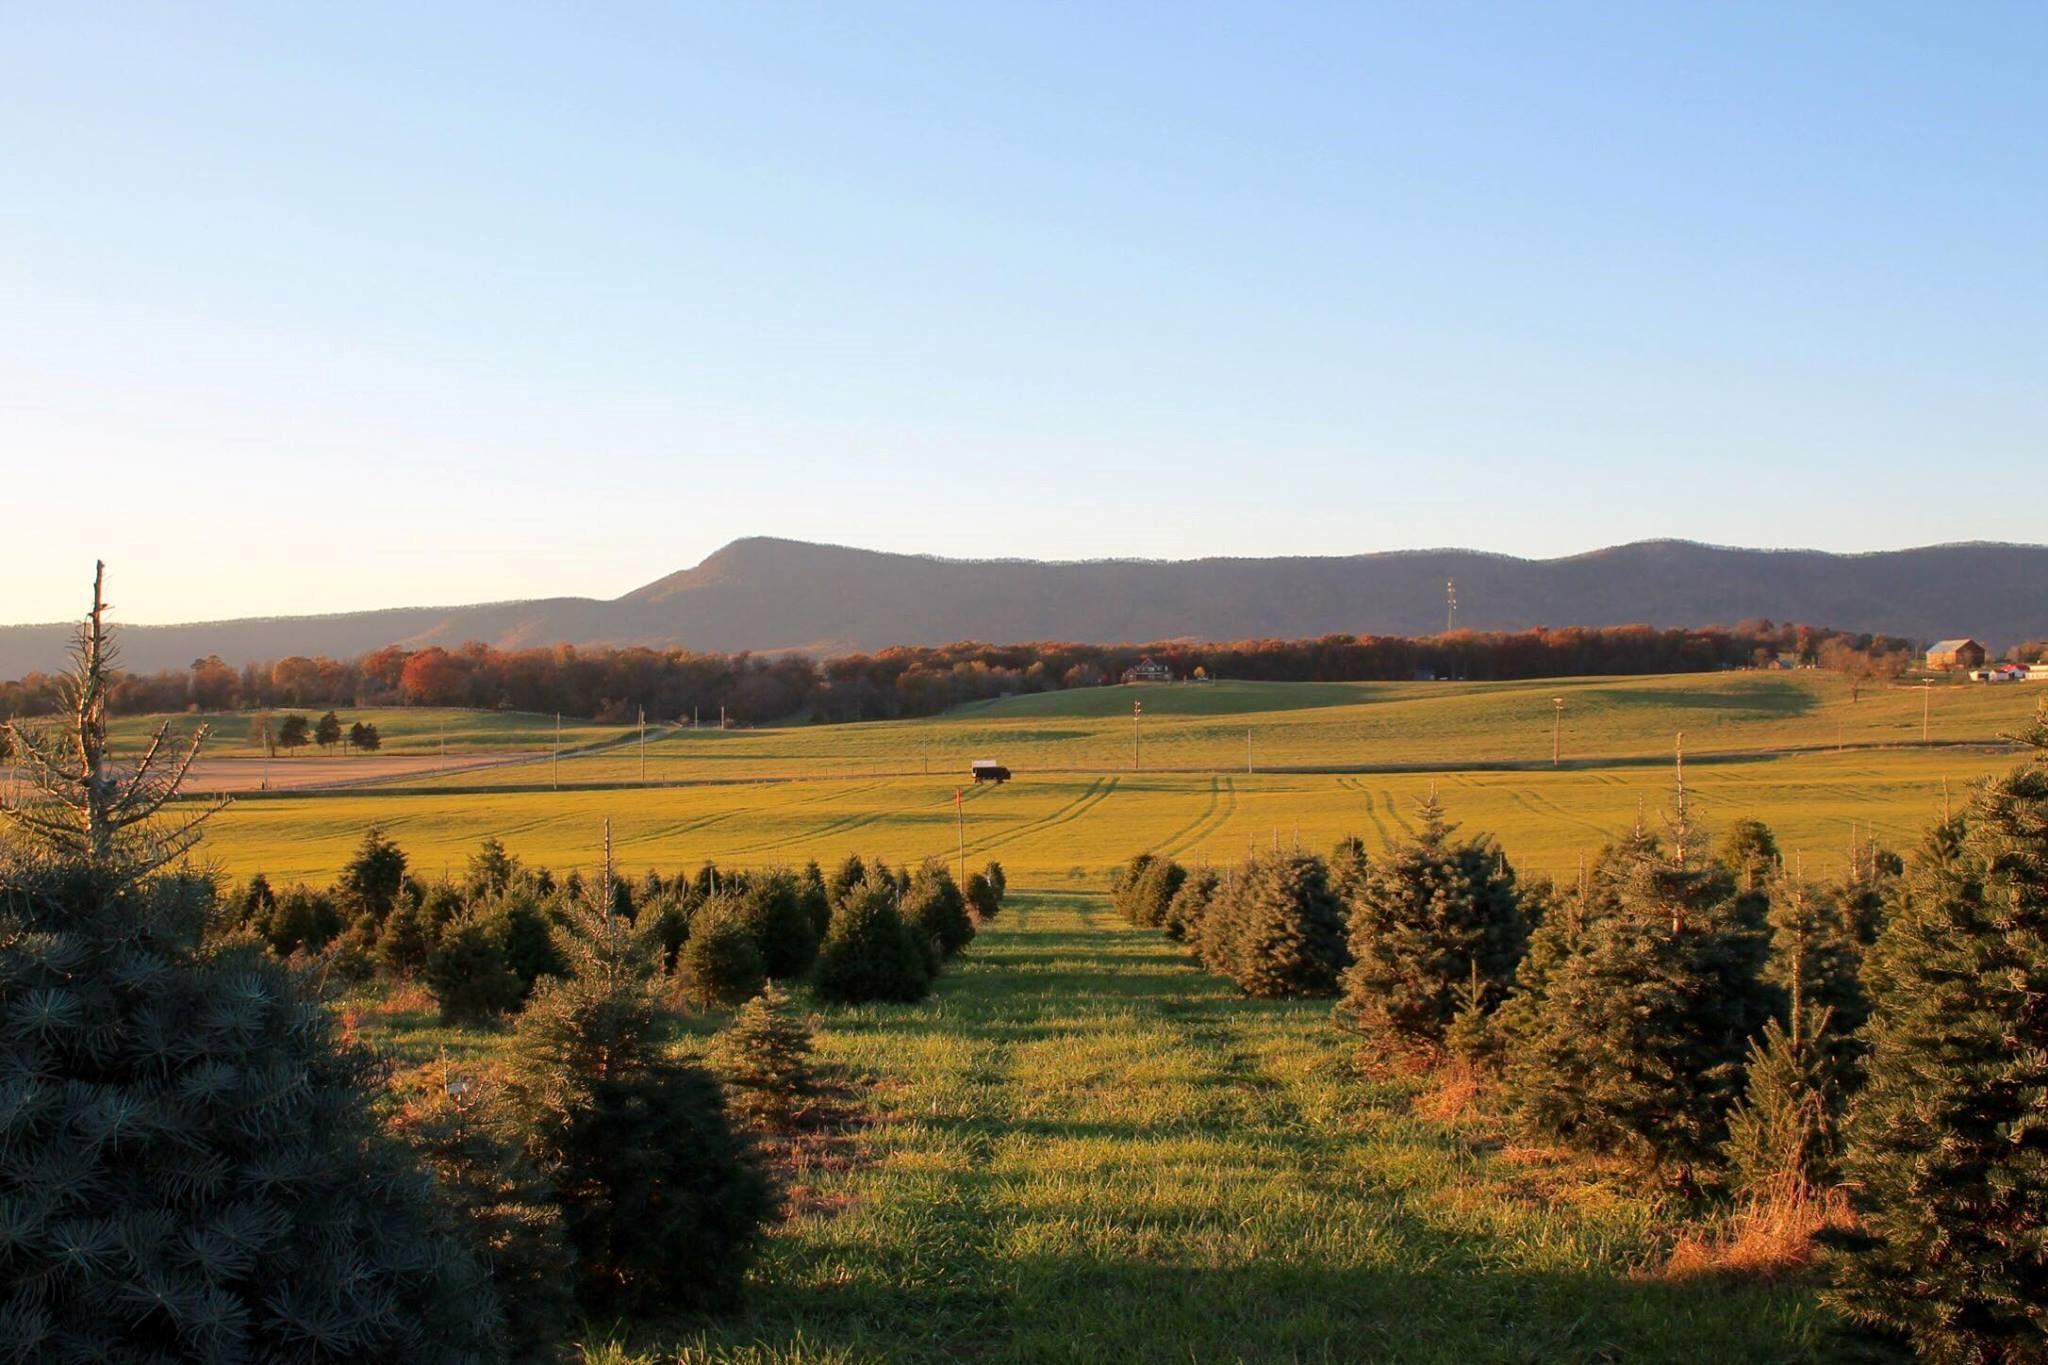 Valley Star Farm christmas tree farm | ChristmasTreeFarms.net